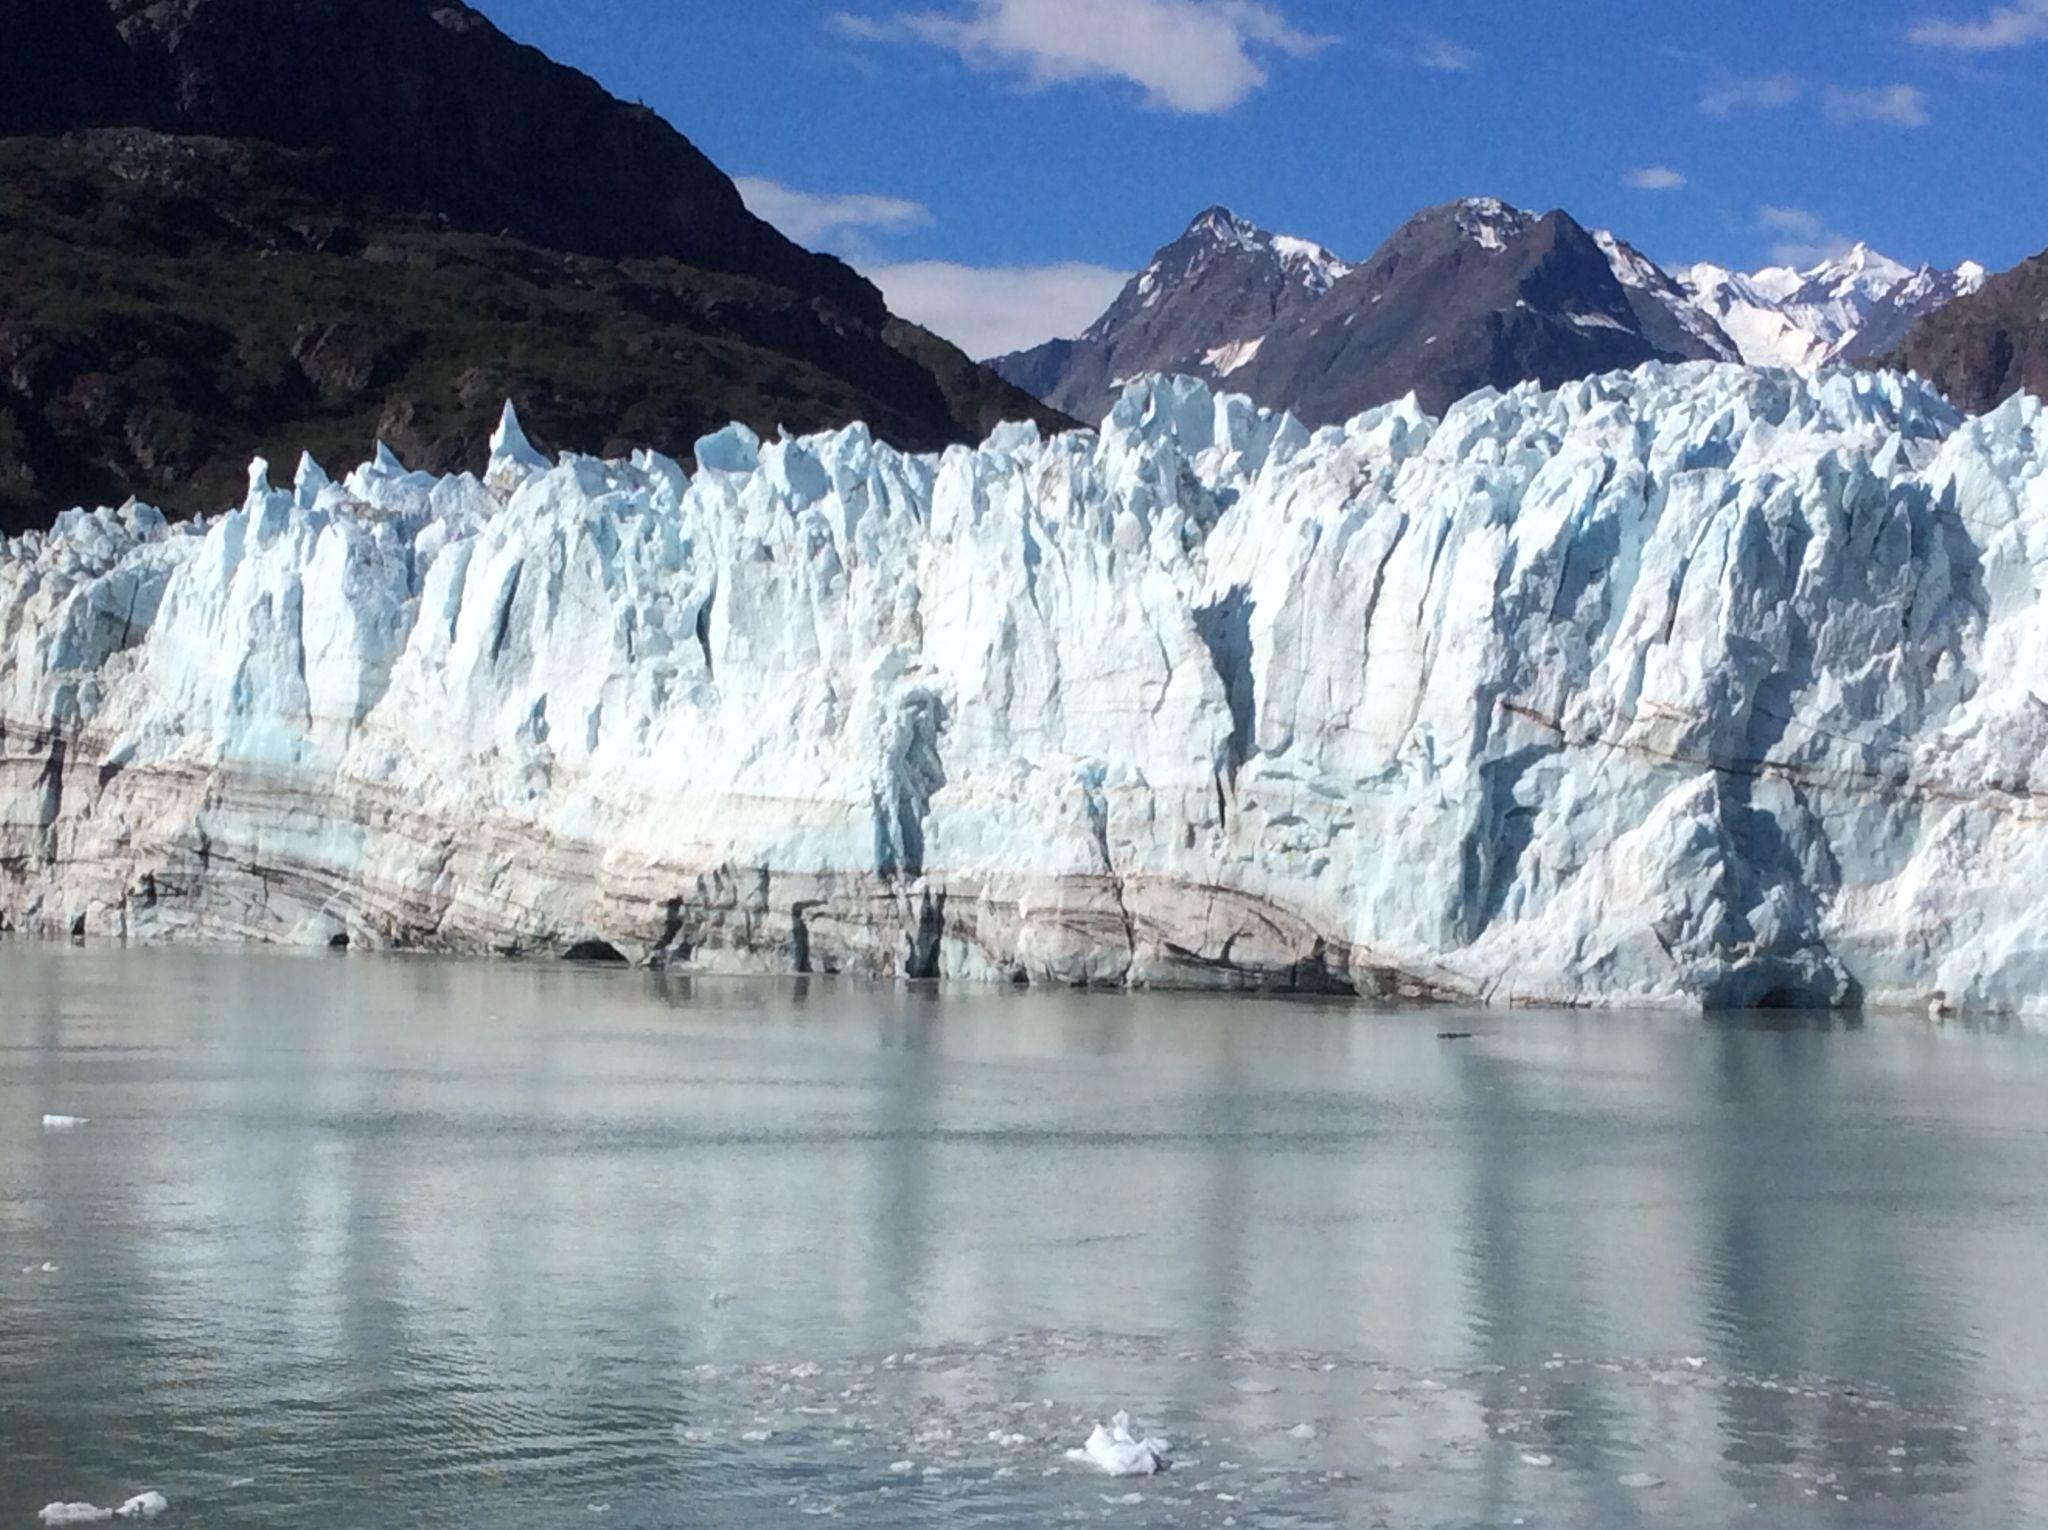 Glacier Bay Large Marg Alaska 2015 Photo by Helen Gordon